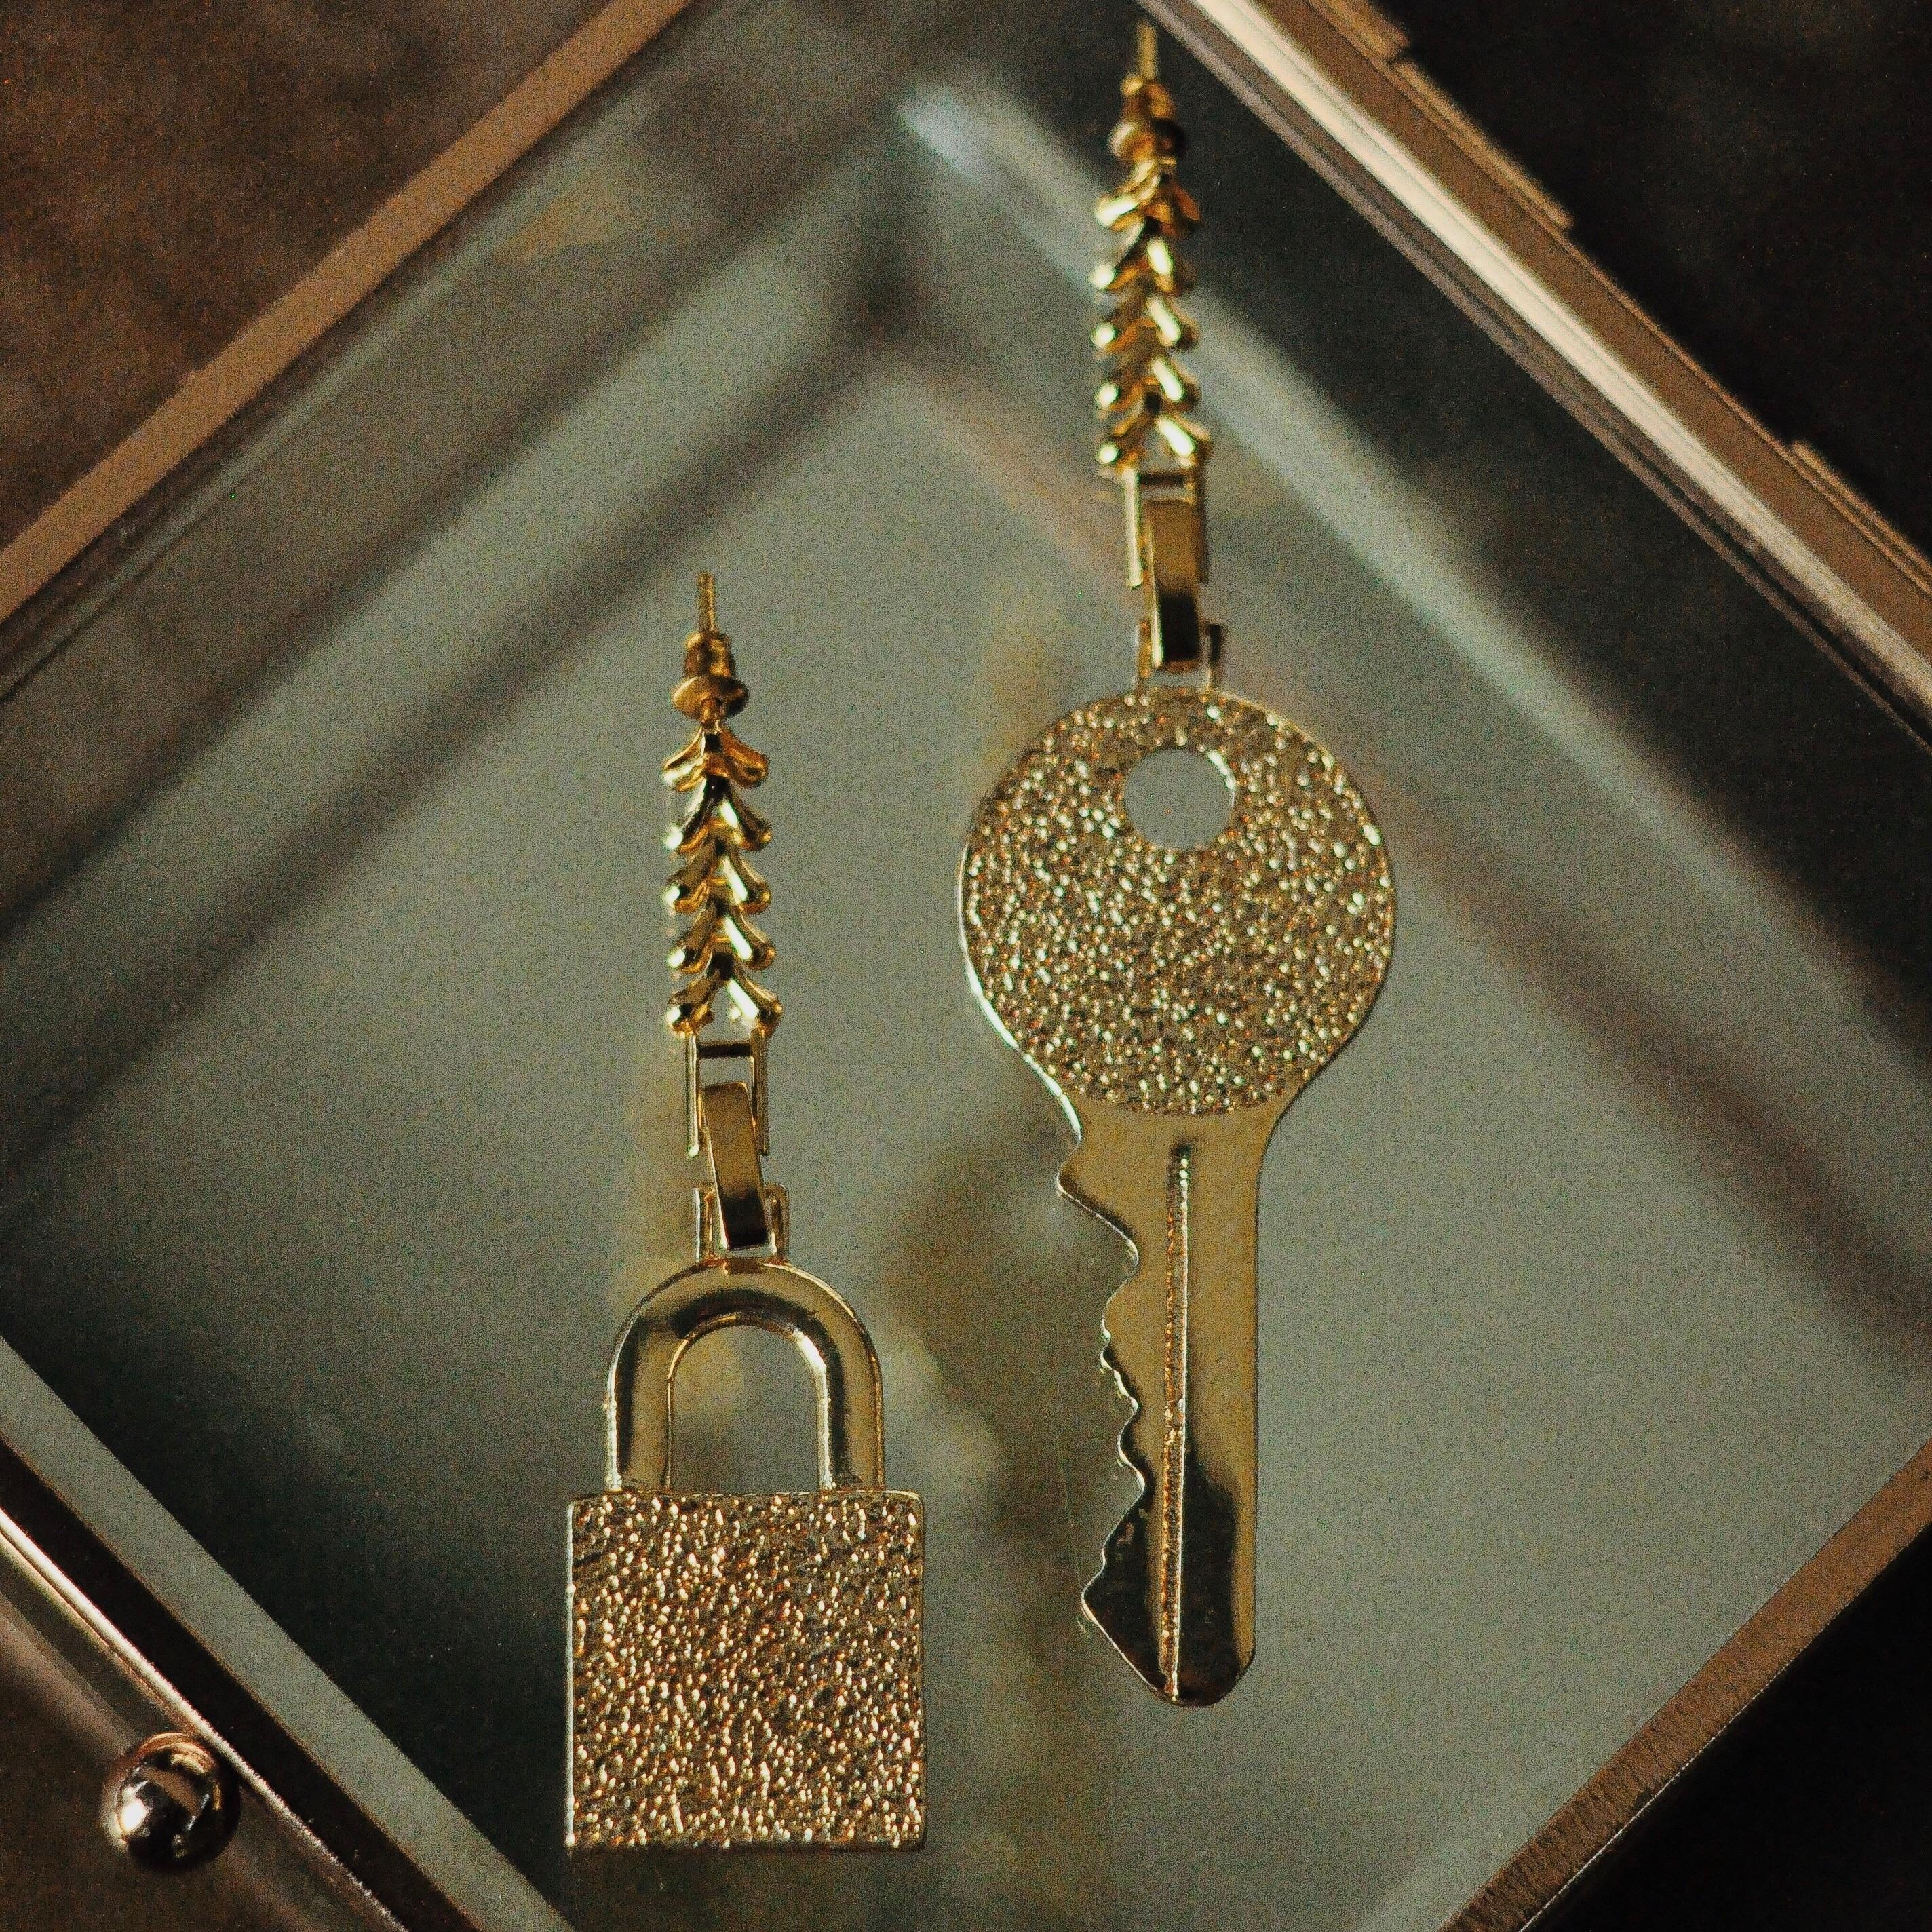 GULCE DERELI, أقراط مُزينة بحُلي بقفل ورمز مفتاح, أقراط للأذن على شكل سلسلة لا نهاية لها, أقراط مُزينة بحُلي, صندوق هدايا, مطلية بالذهب/الفضة